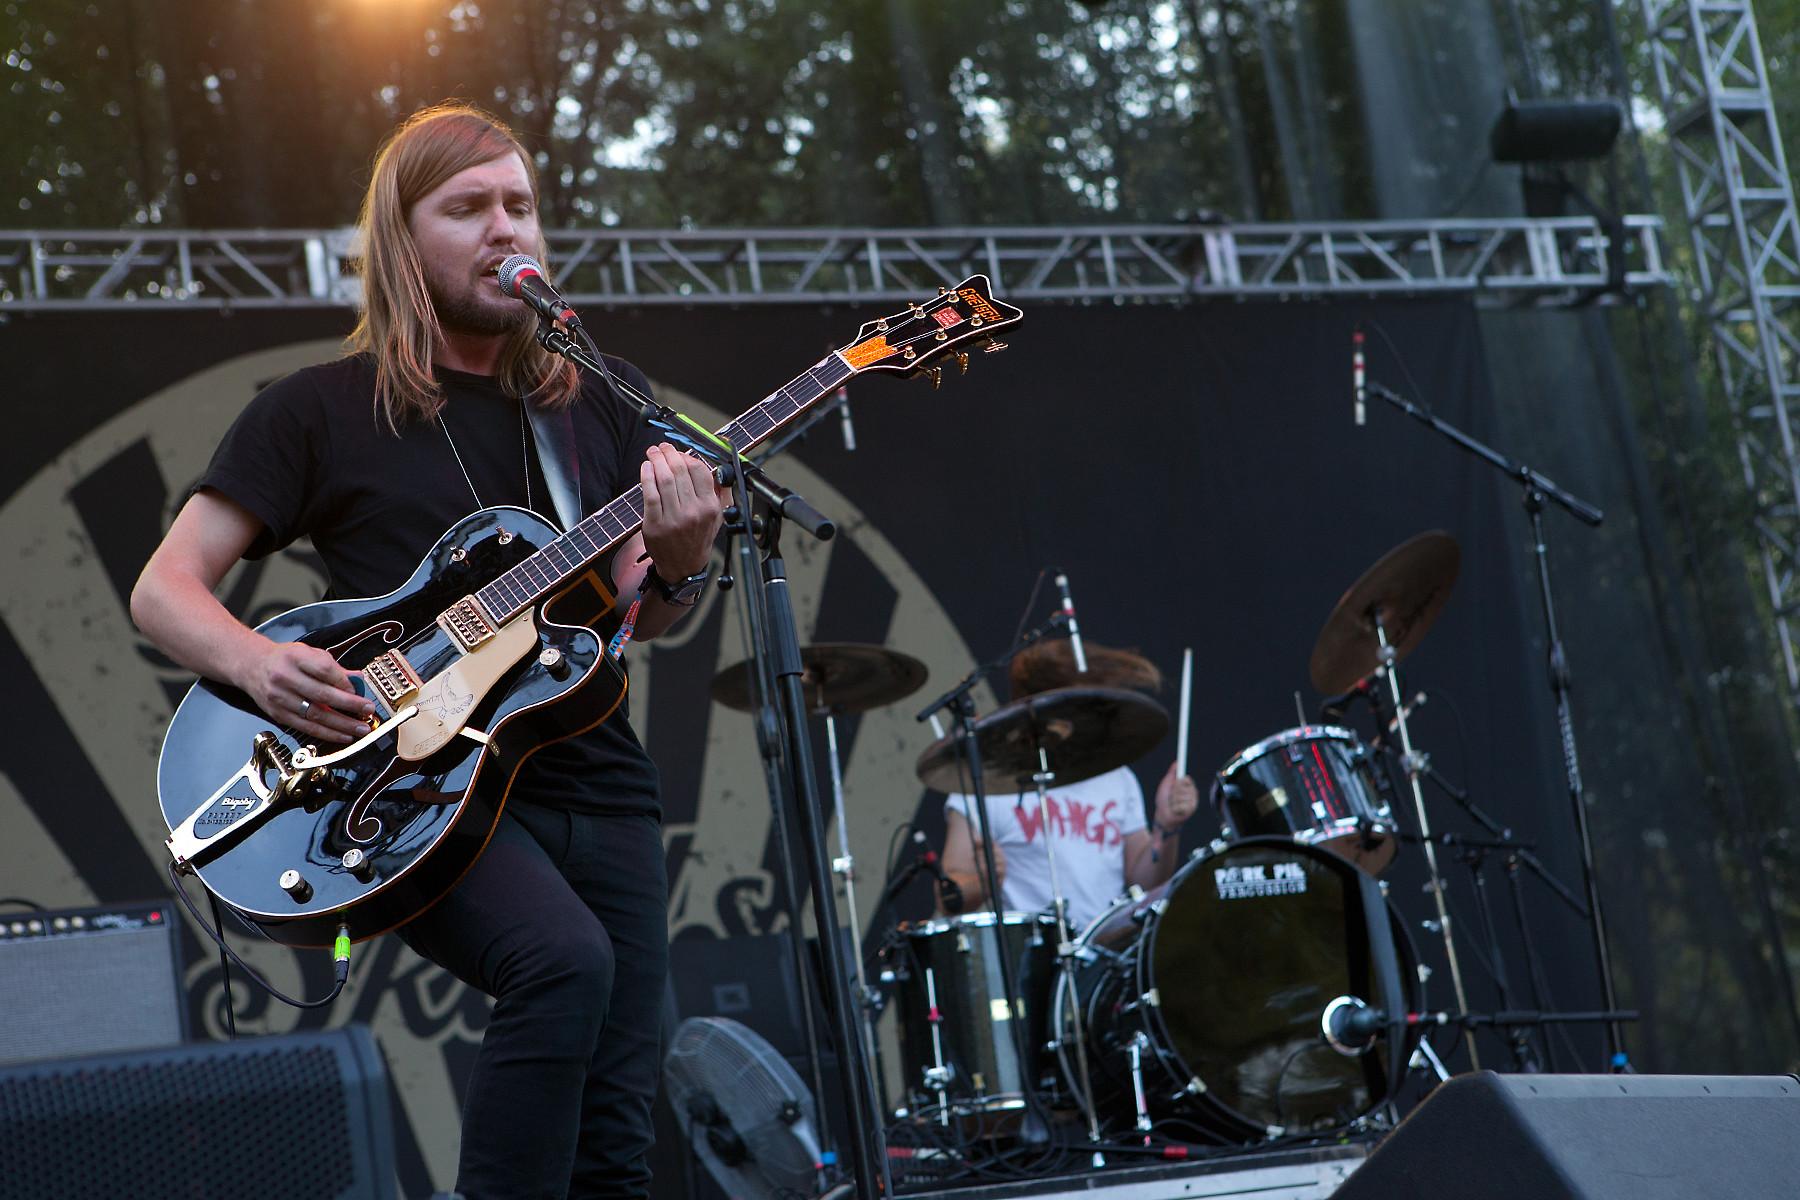 Band Of Skulls @ Lollapalooza 2012